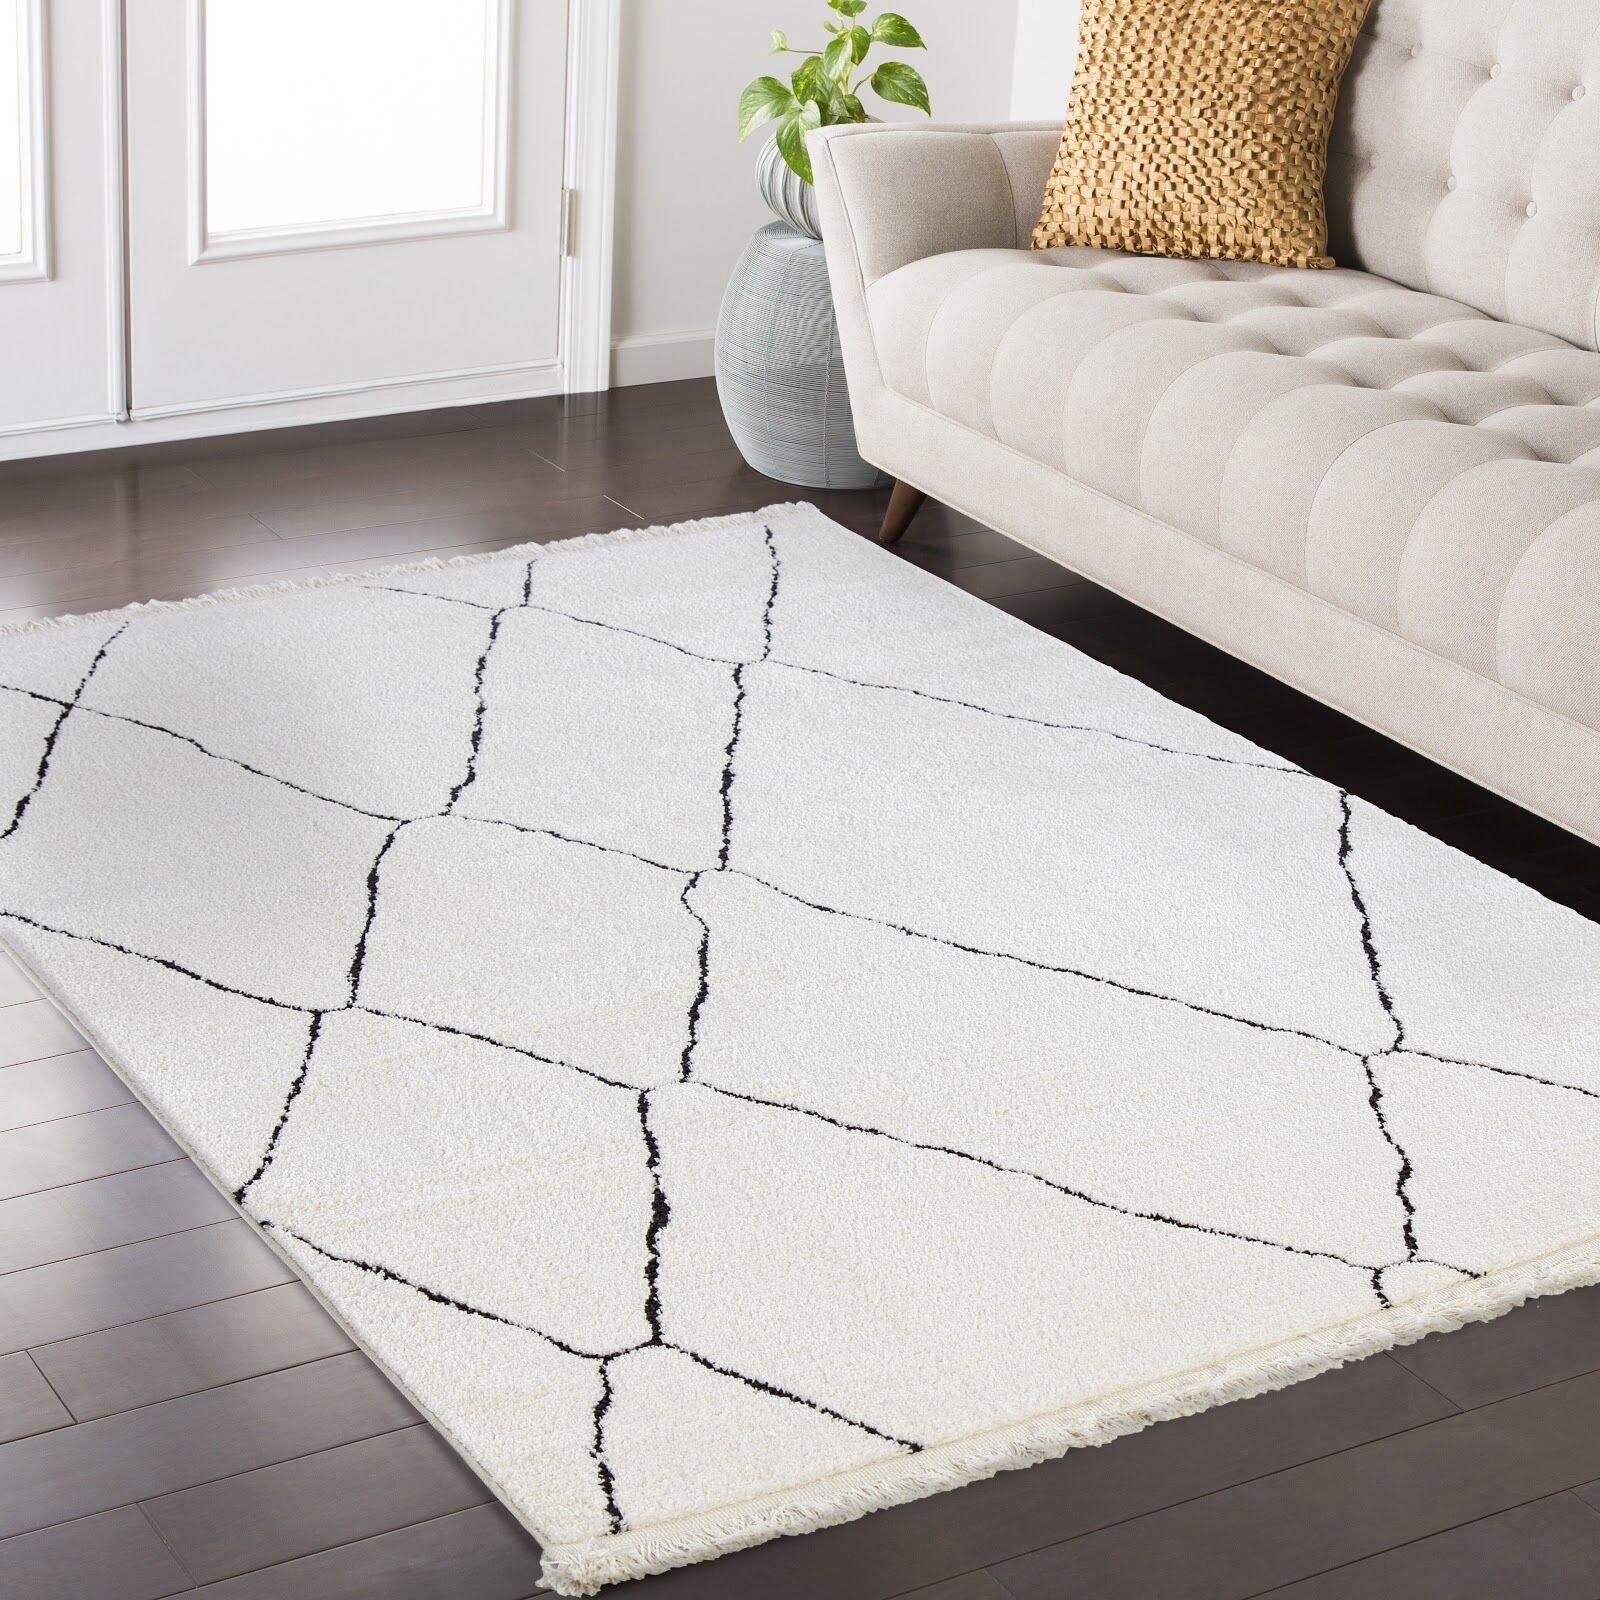 Hervey White/Charcoal Area Rug Rug Size: Rectangle 3'9